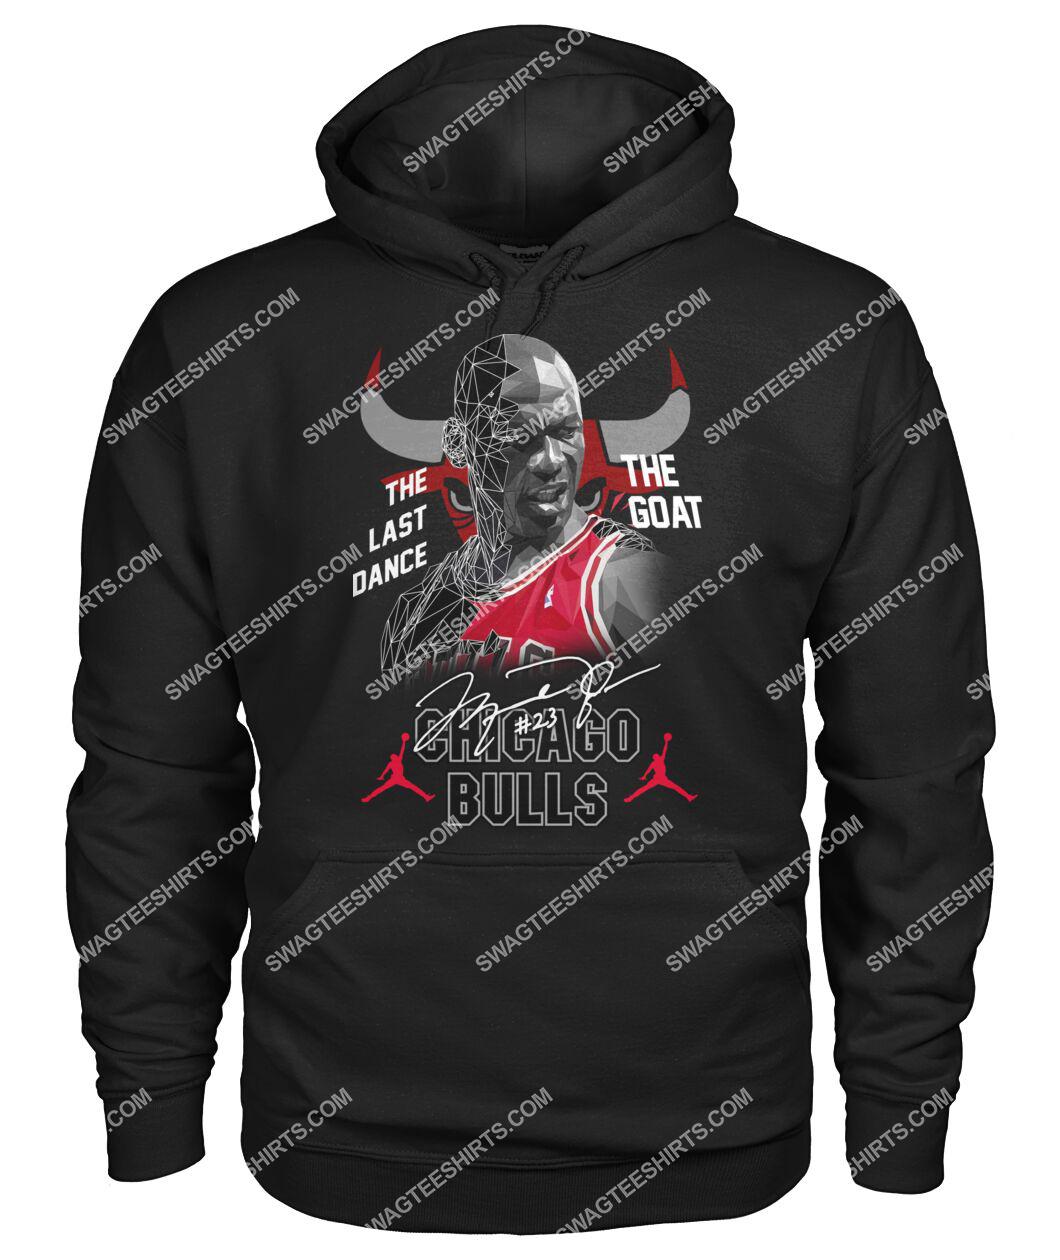 chicago bulls michael jordan the last dance the goat signature hoodie 1